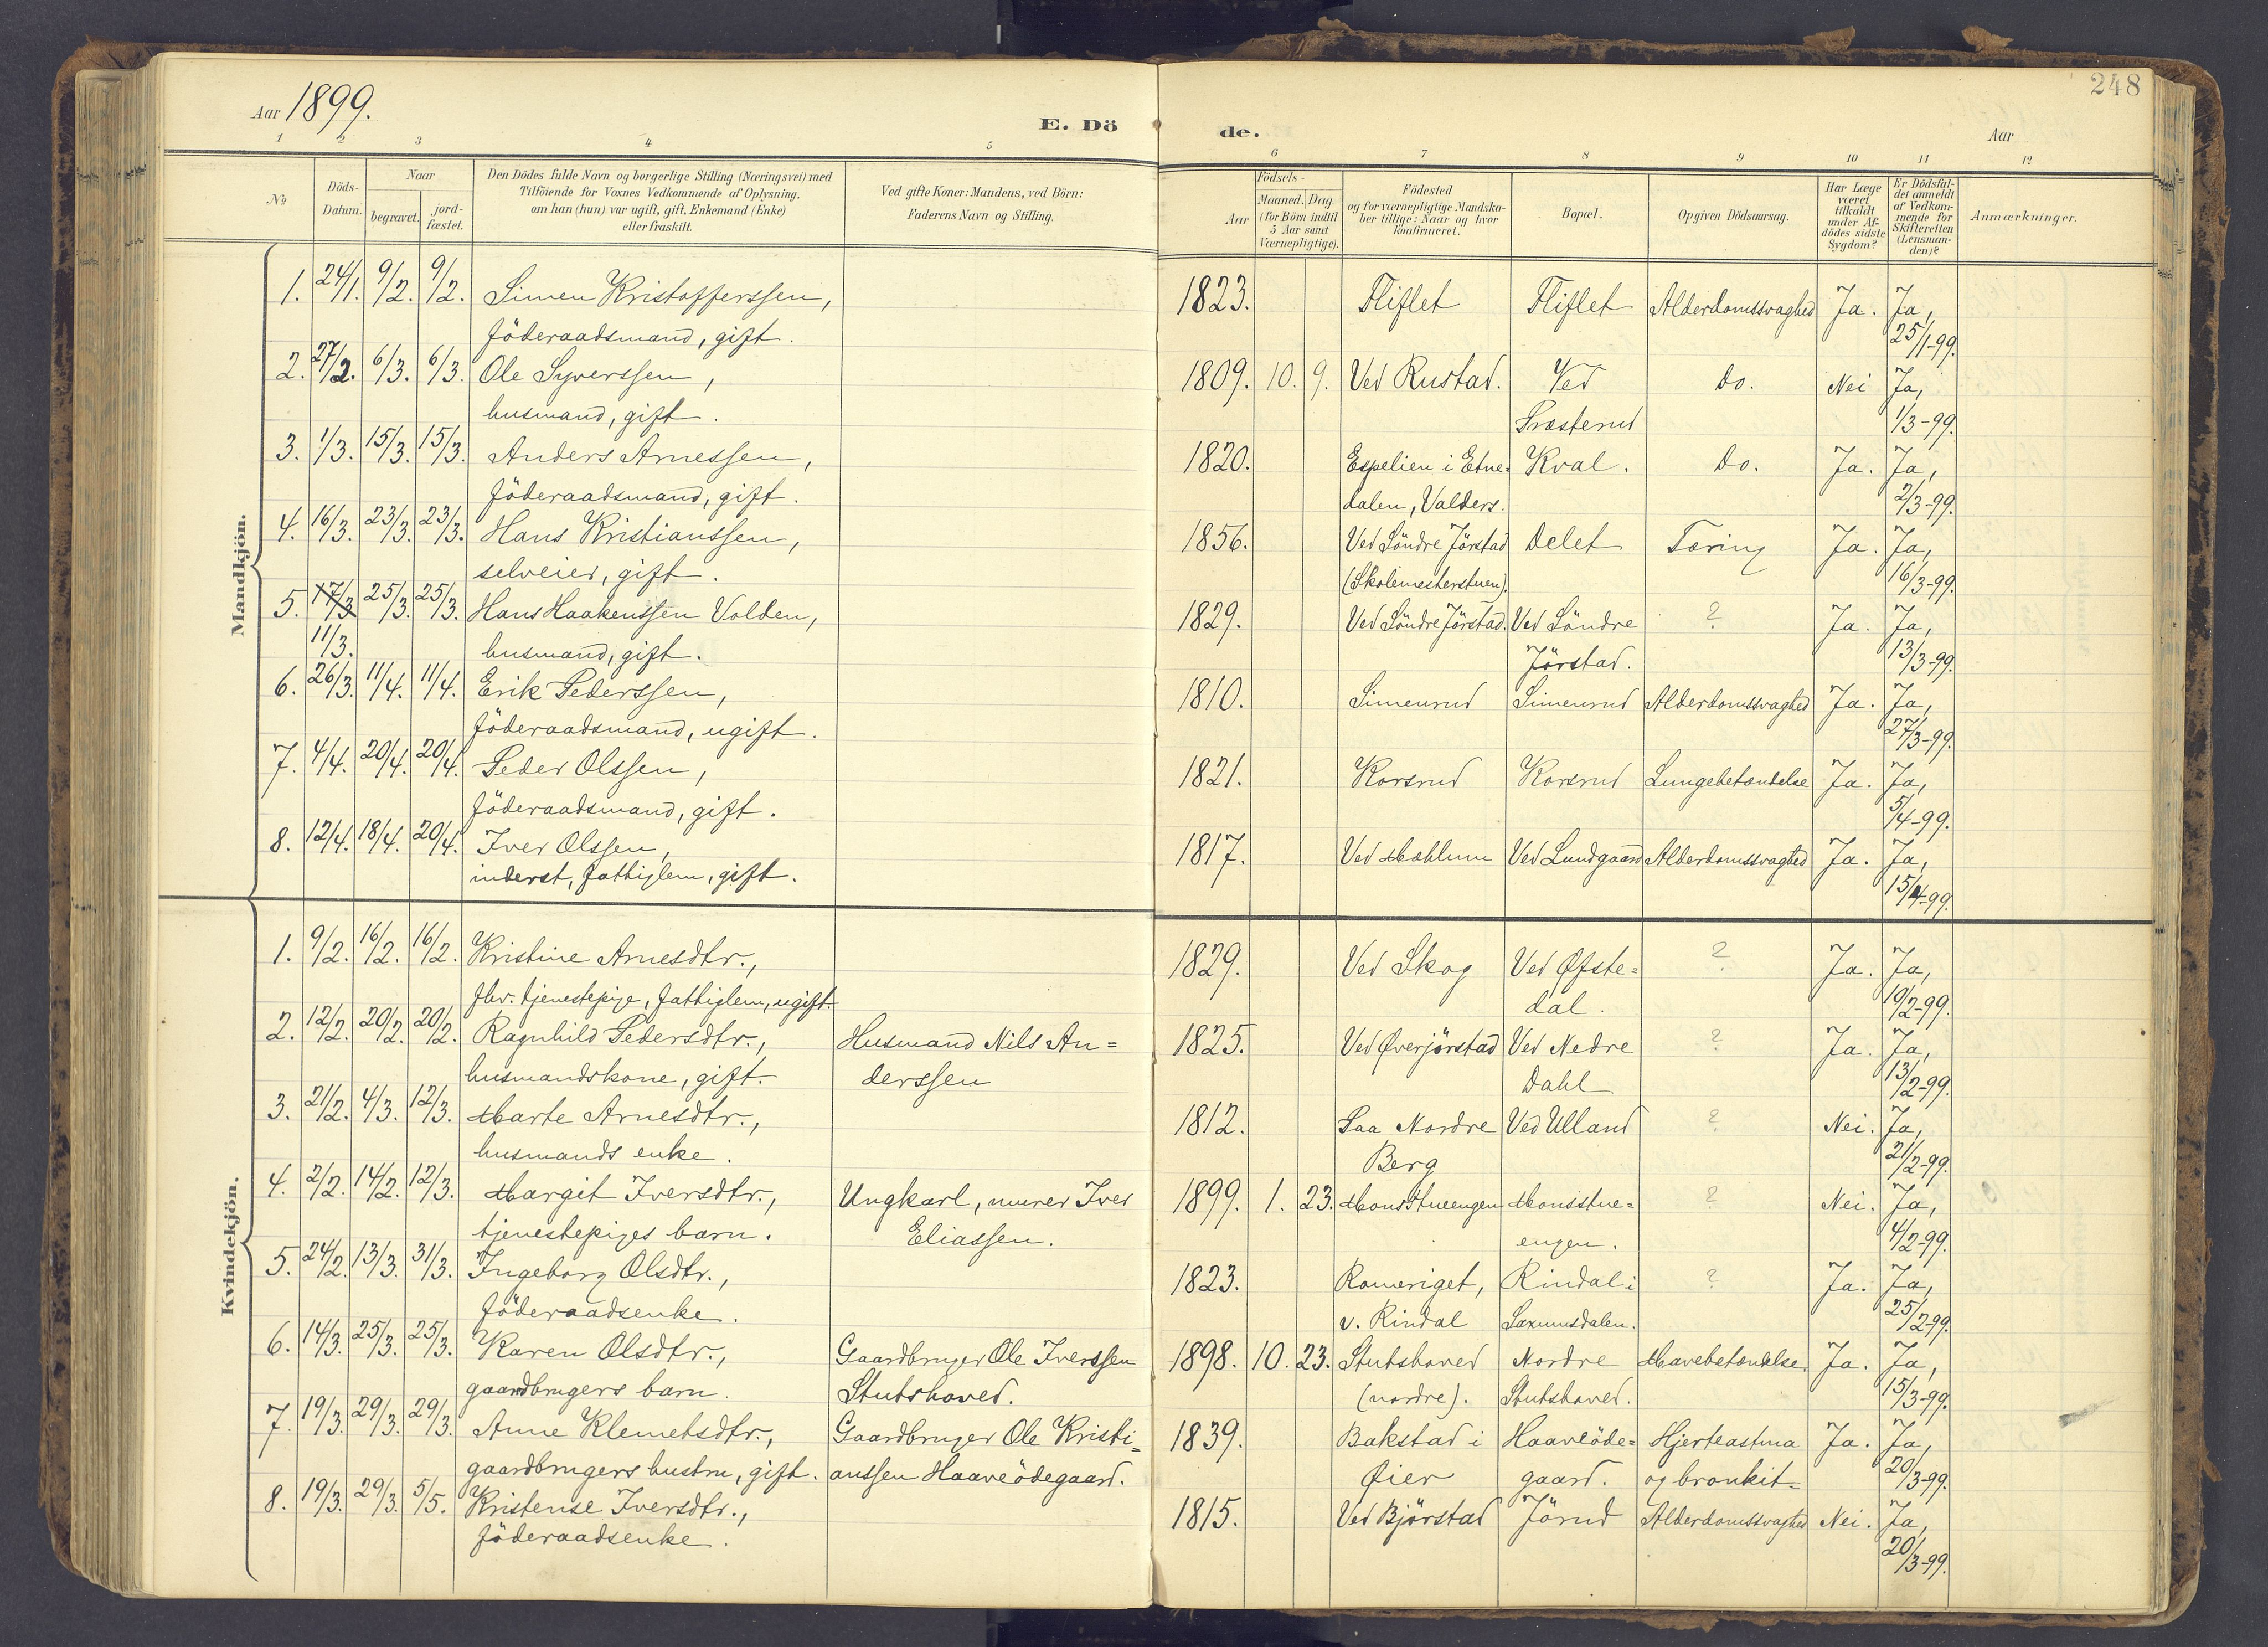 SAH, Fåberg prestekontor, Ministerialbok nr. 12, 1899-1915, s. 248